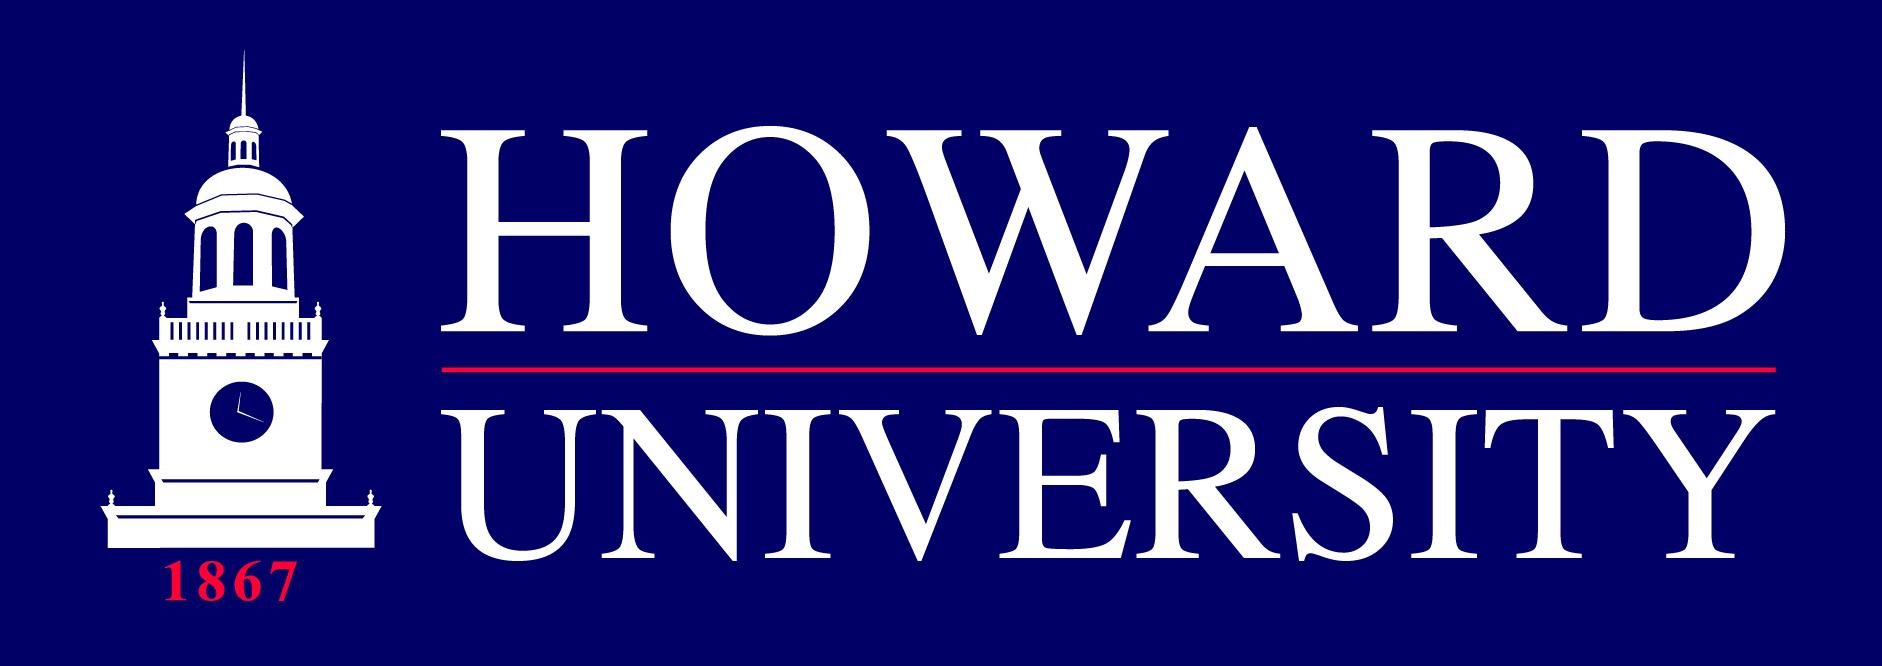 Howard University Logos Brands Directory